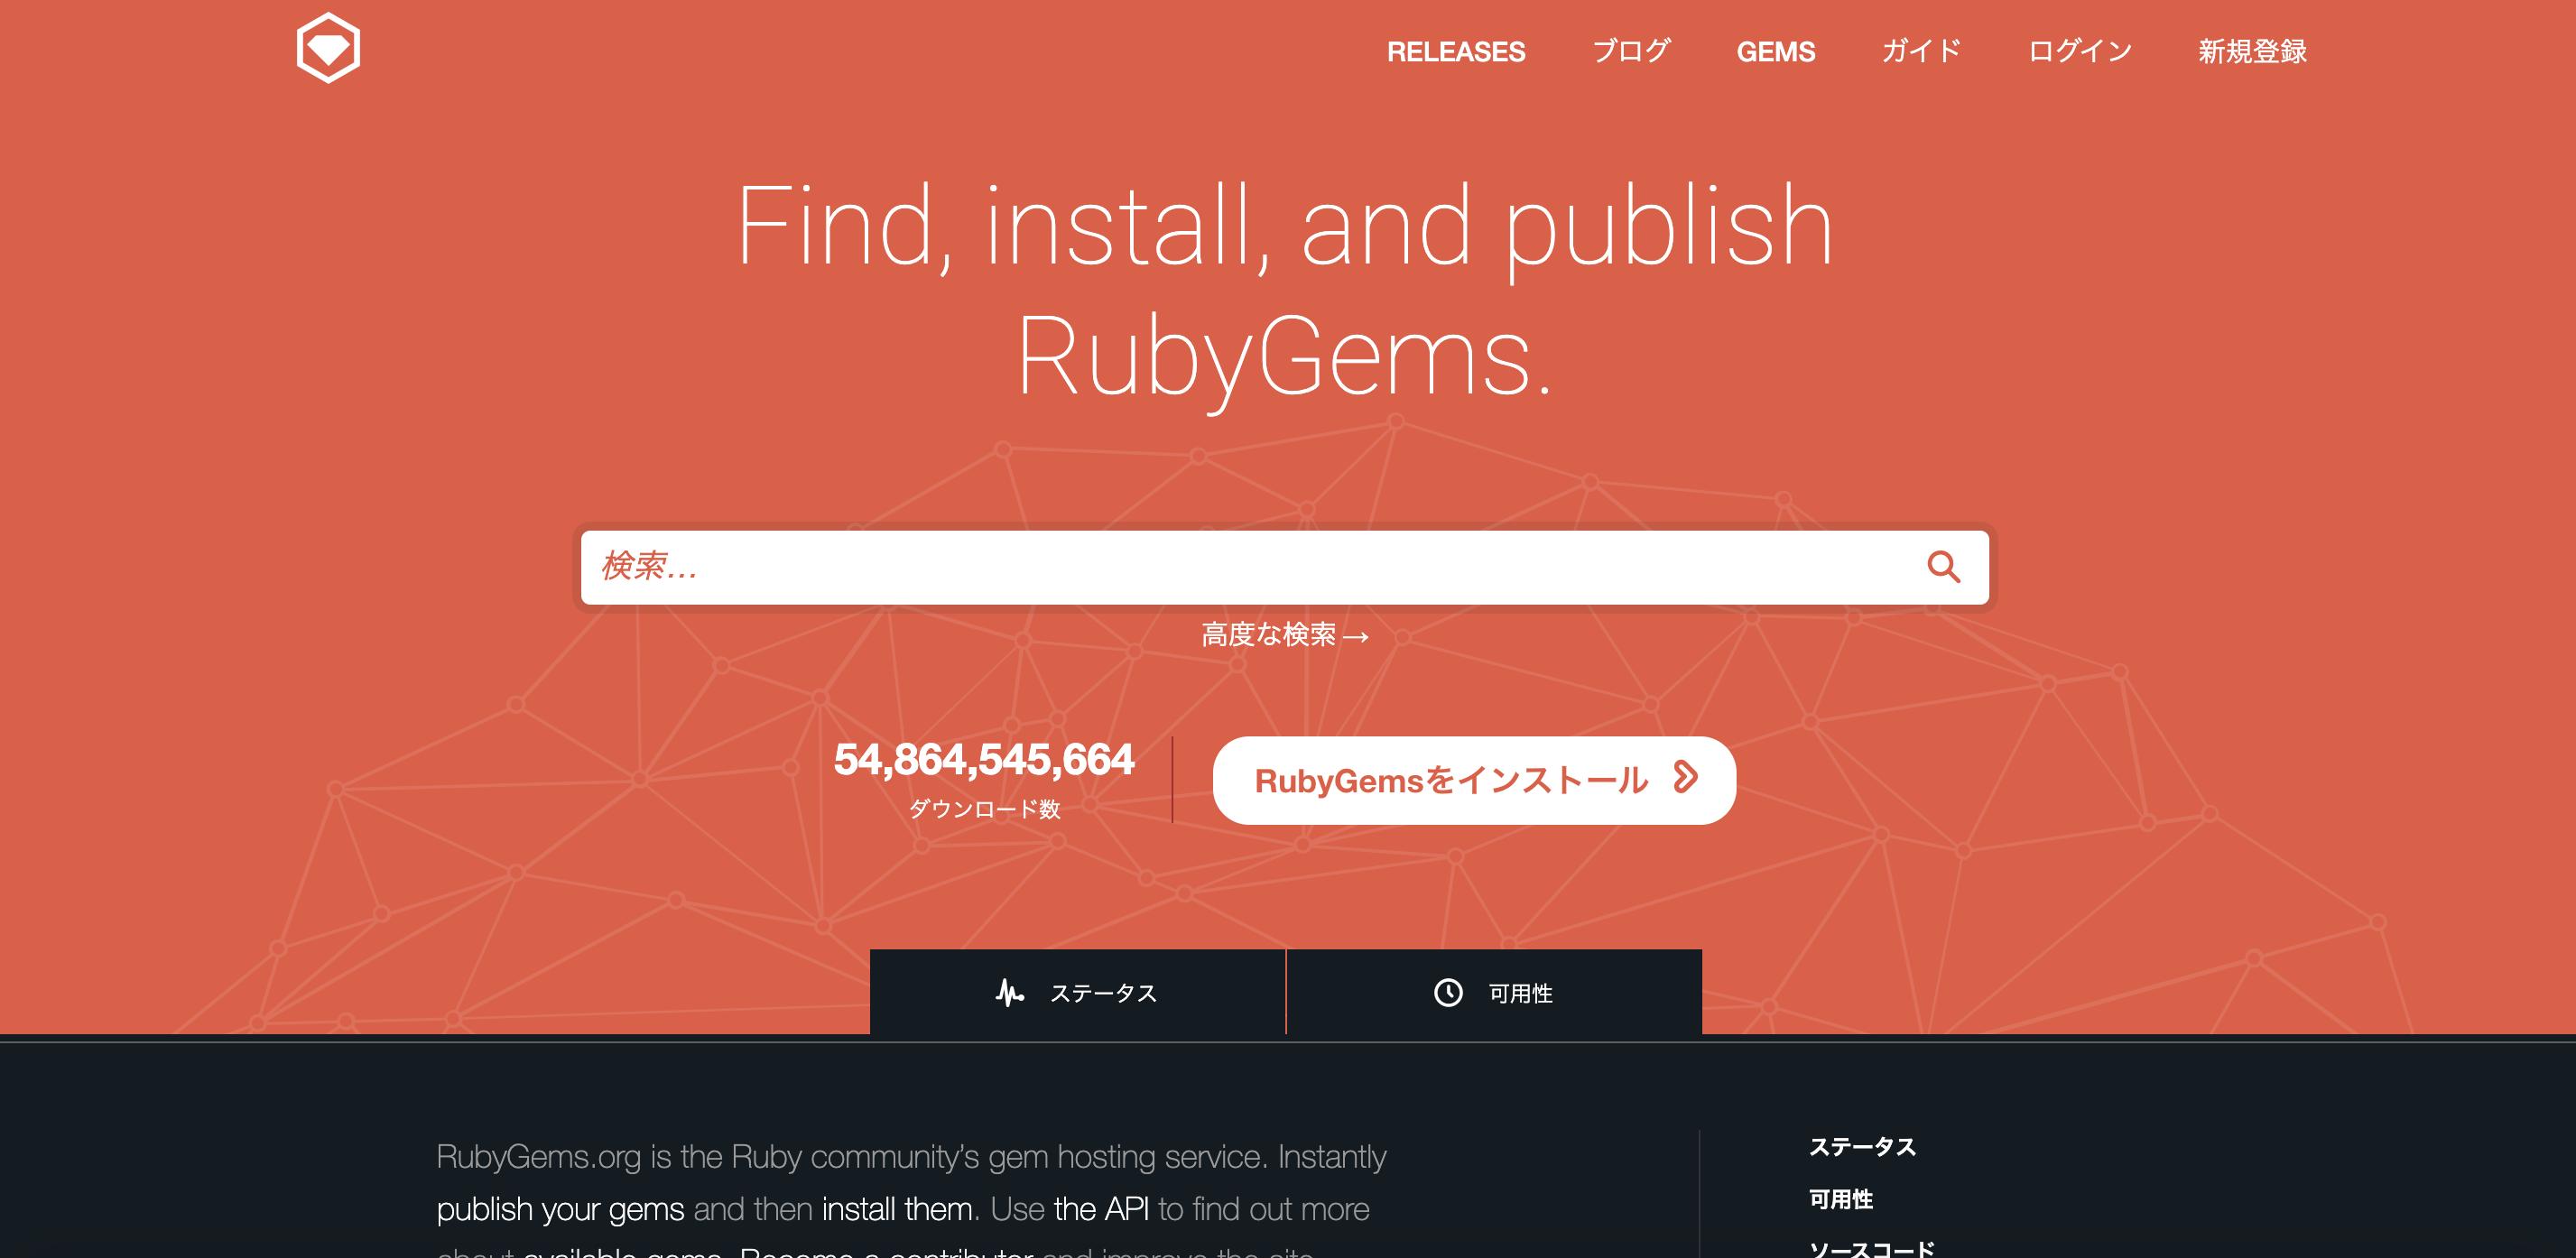 RubyGems.org サイト